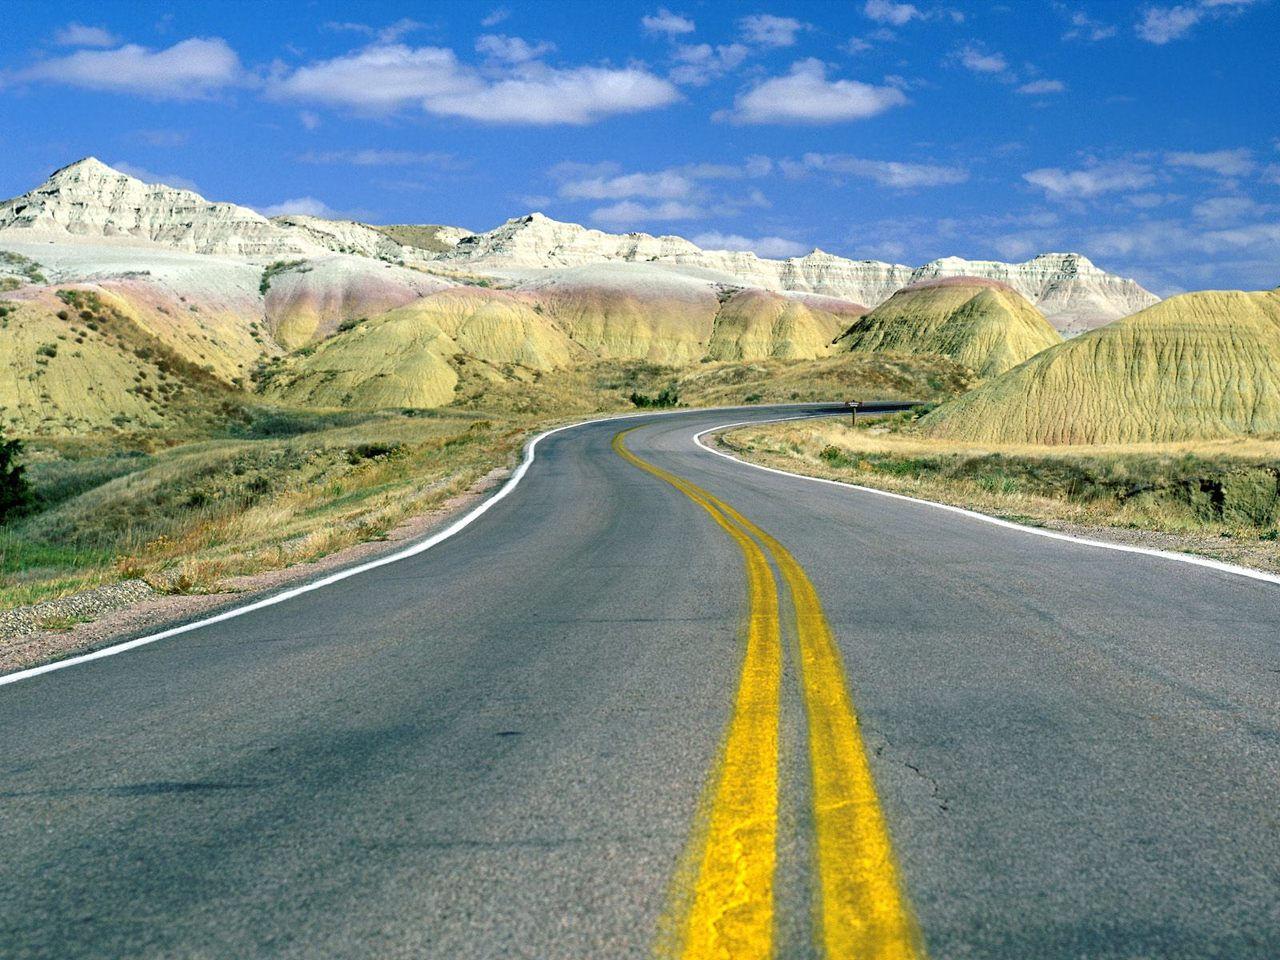 Roadscape-Badlands-National-Park-South-Dakota.jpg